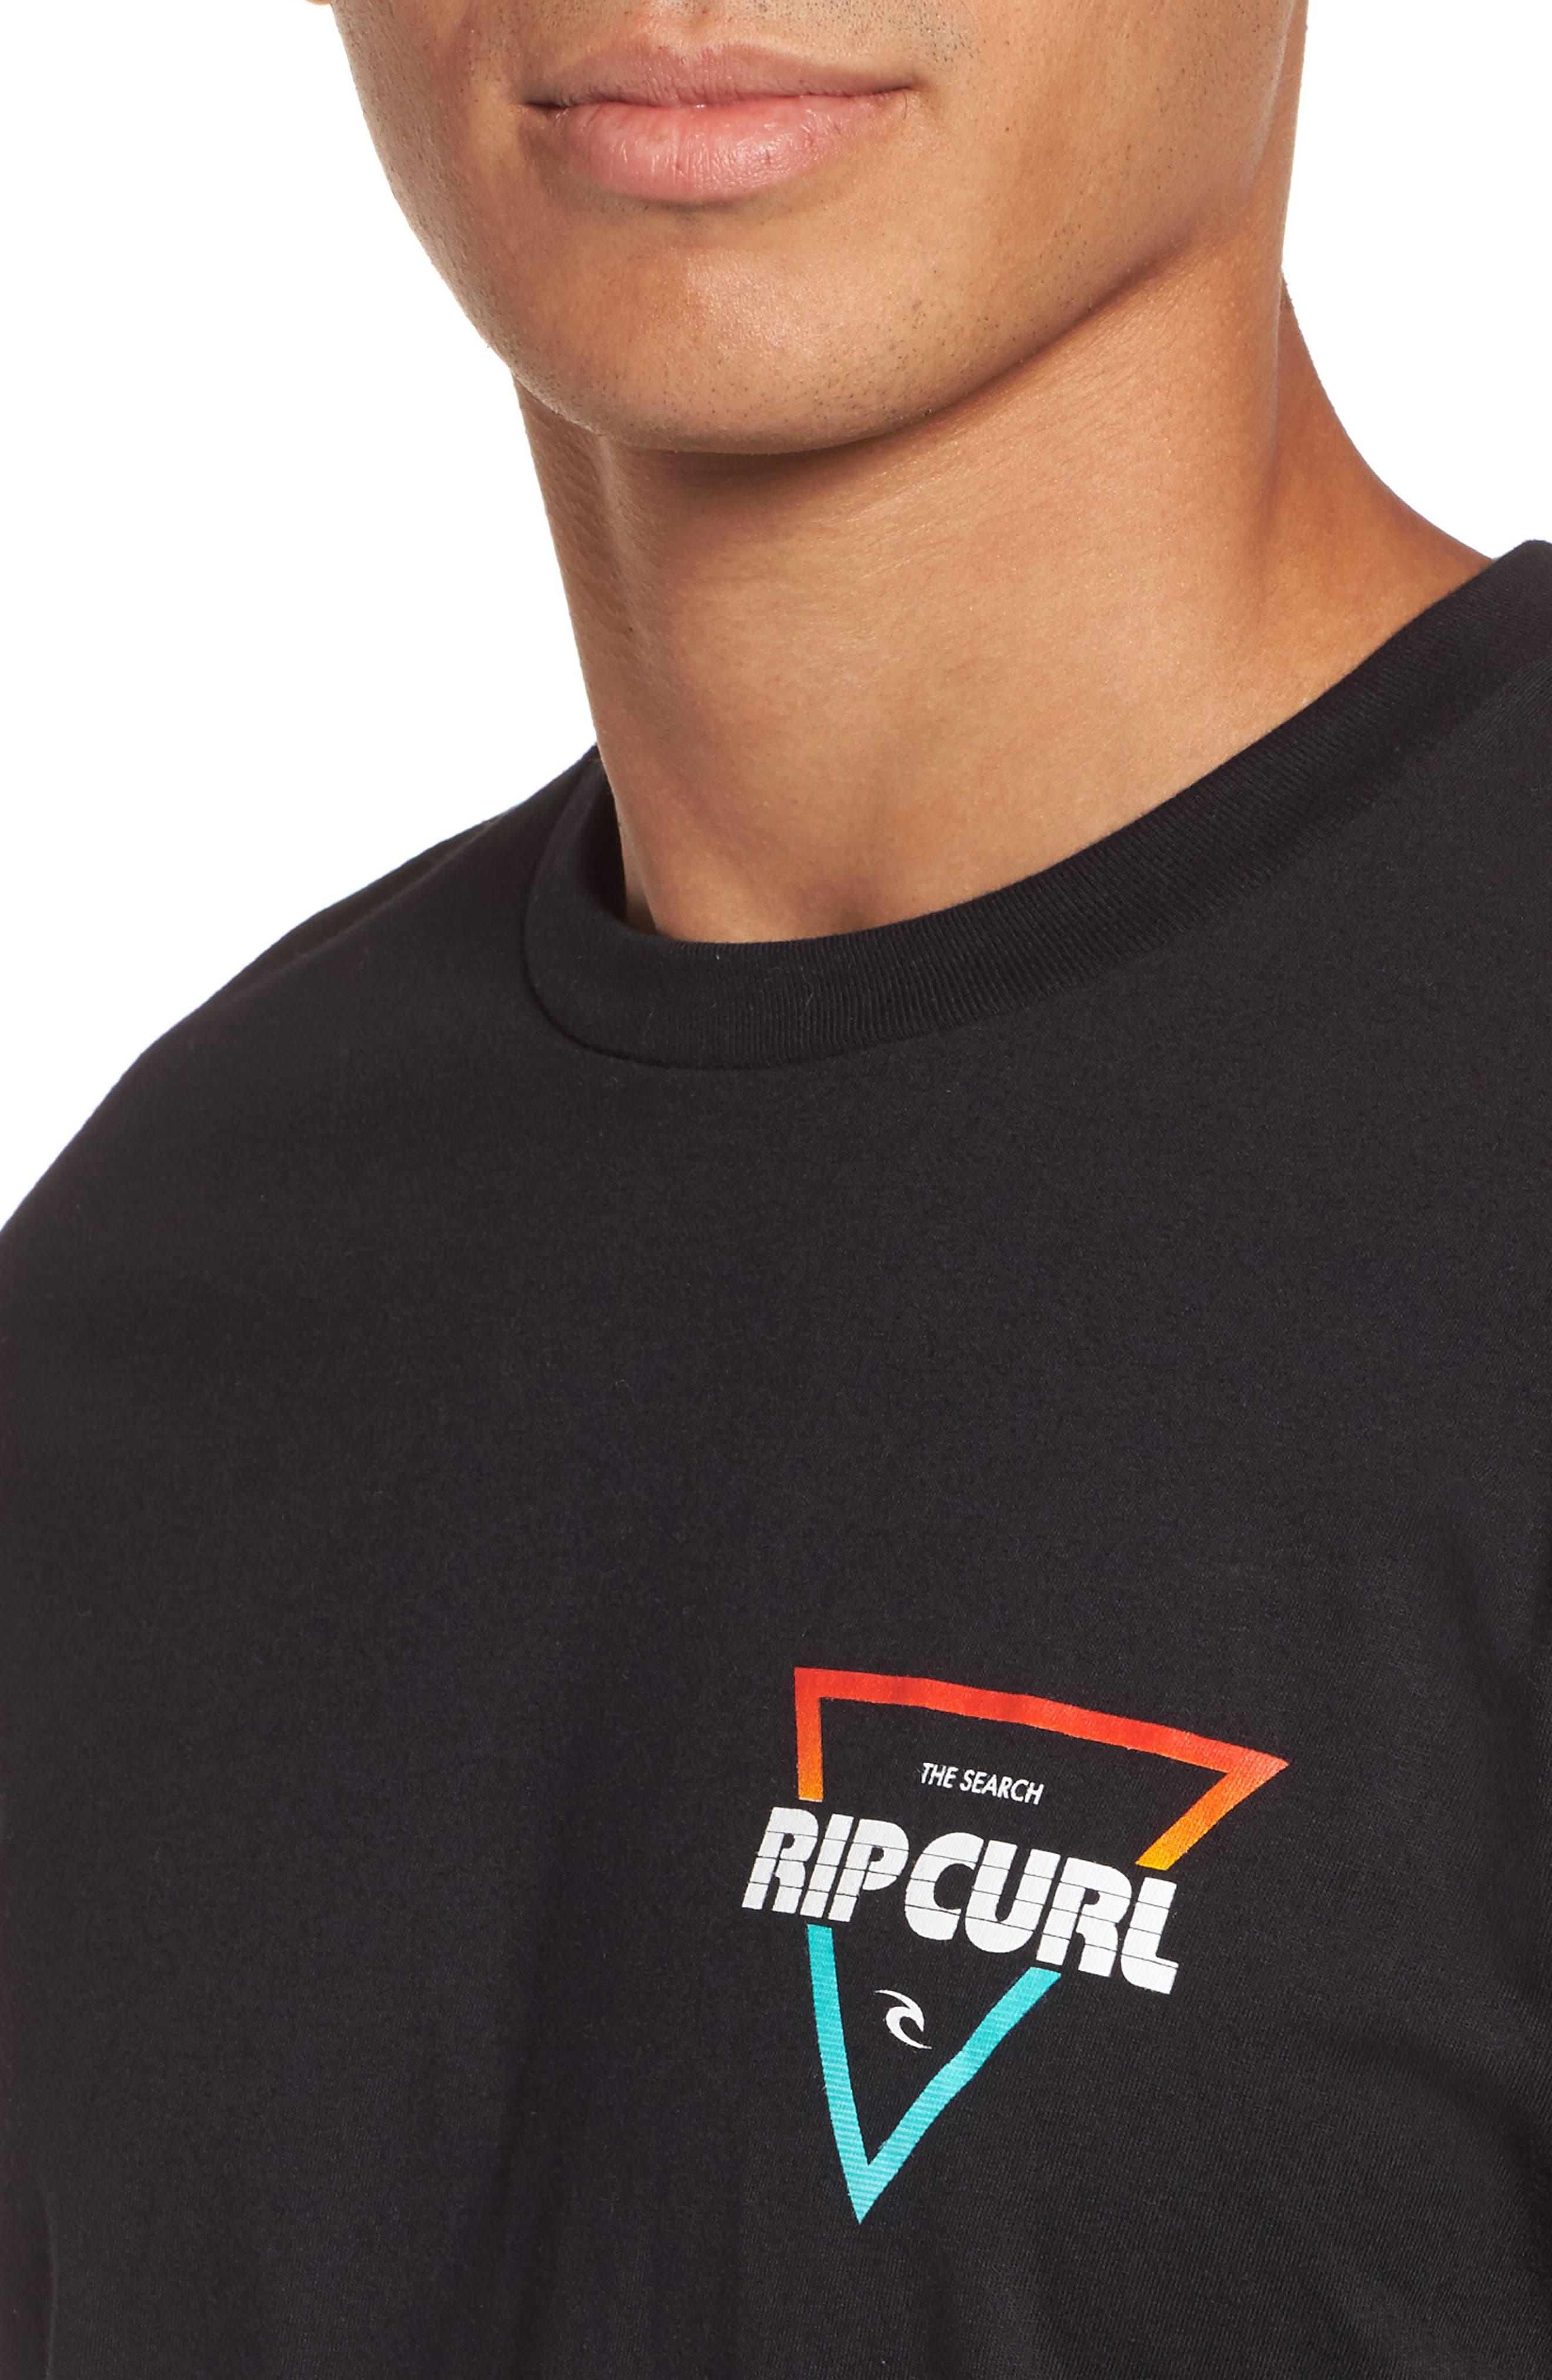 The Edge Premium Graphic T-Shirt,                             Alternate thumbnail 4, color,                             Black